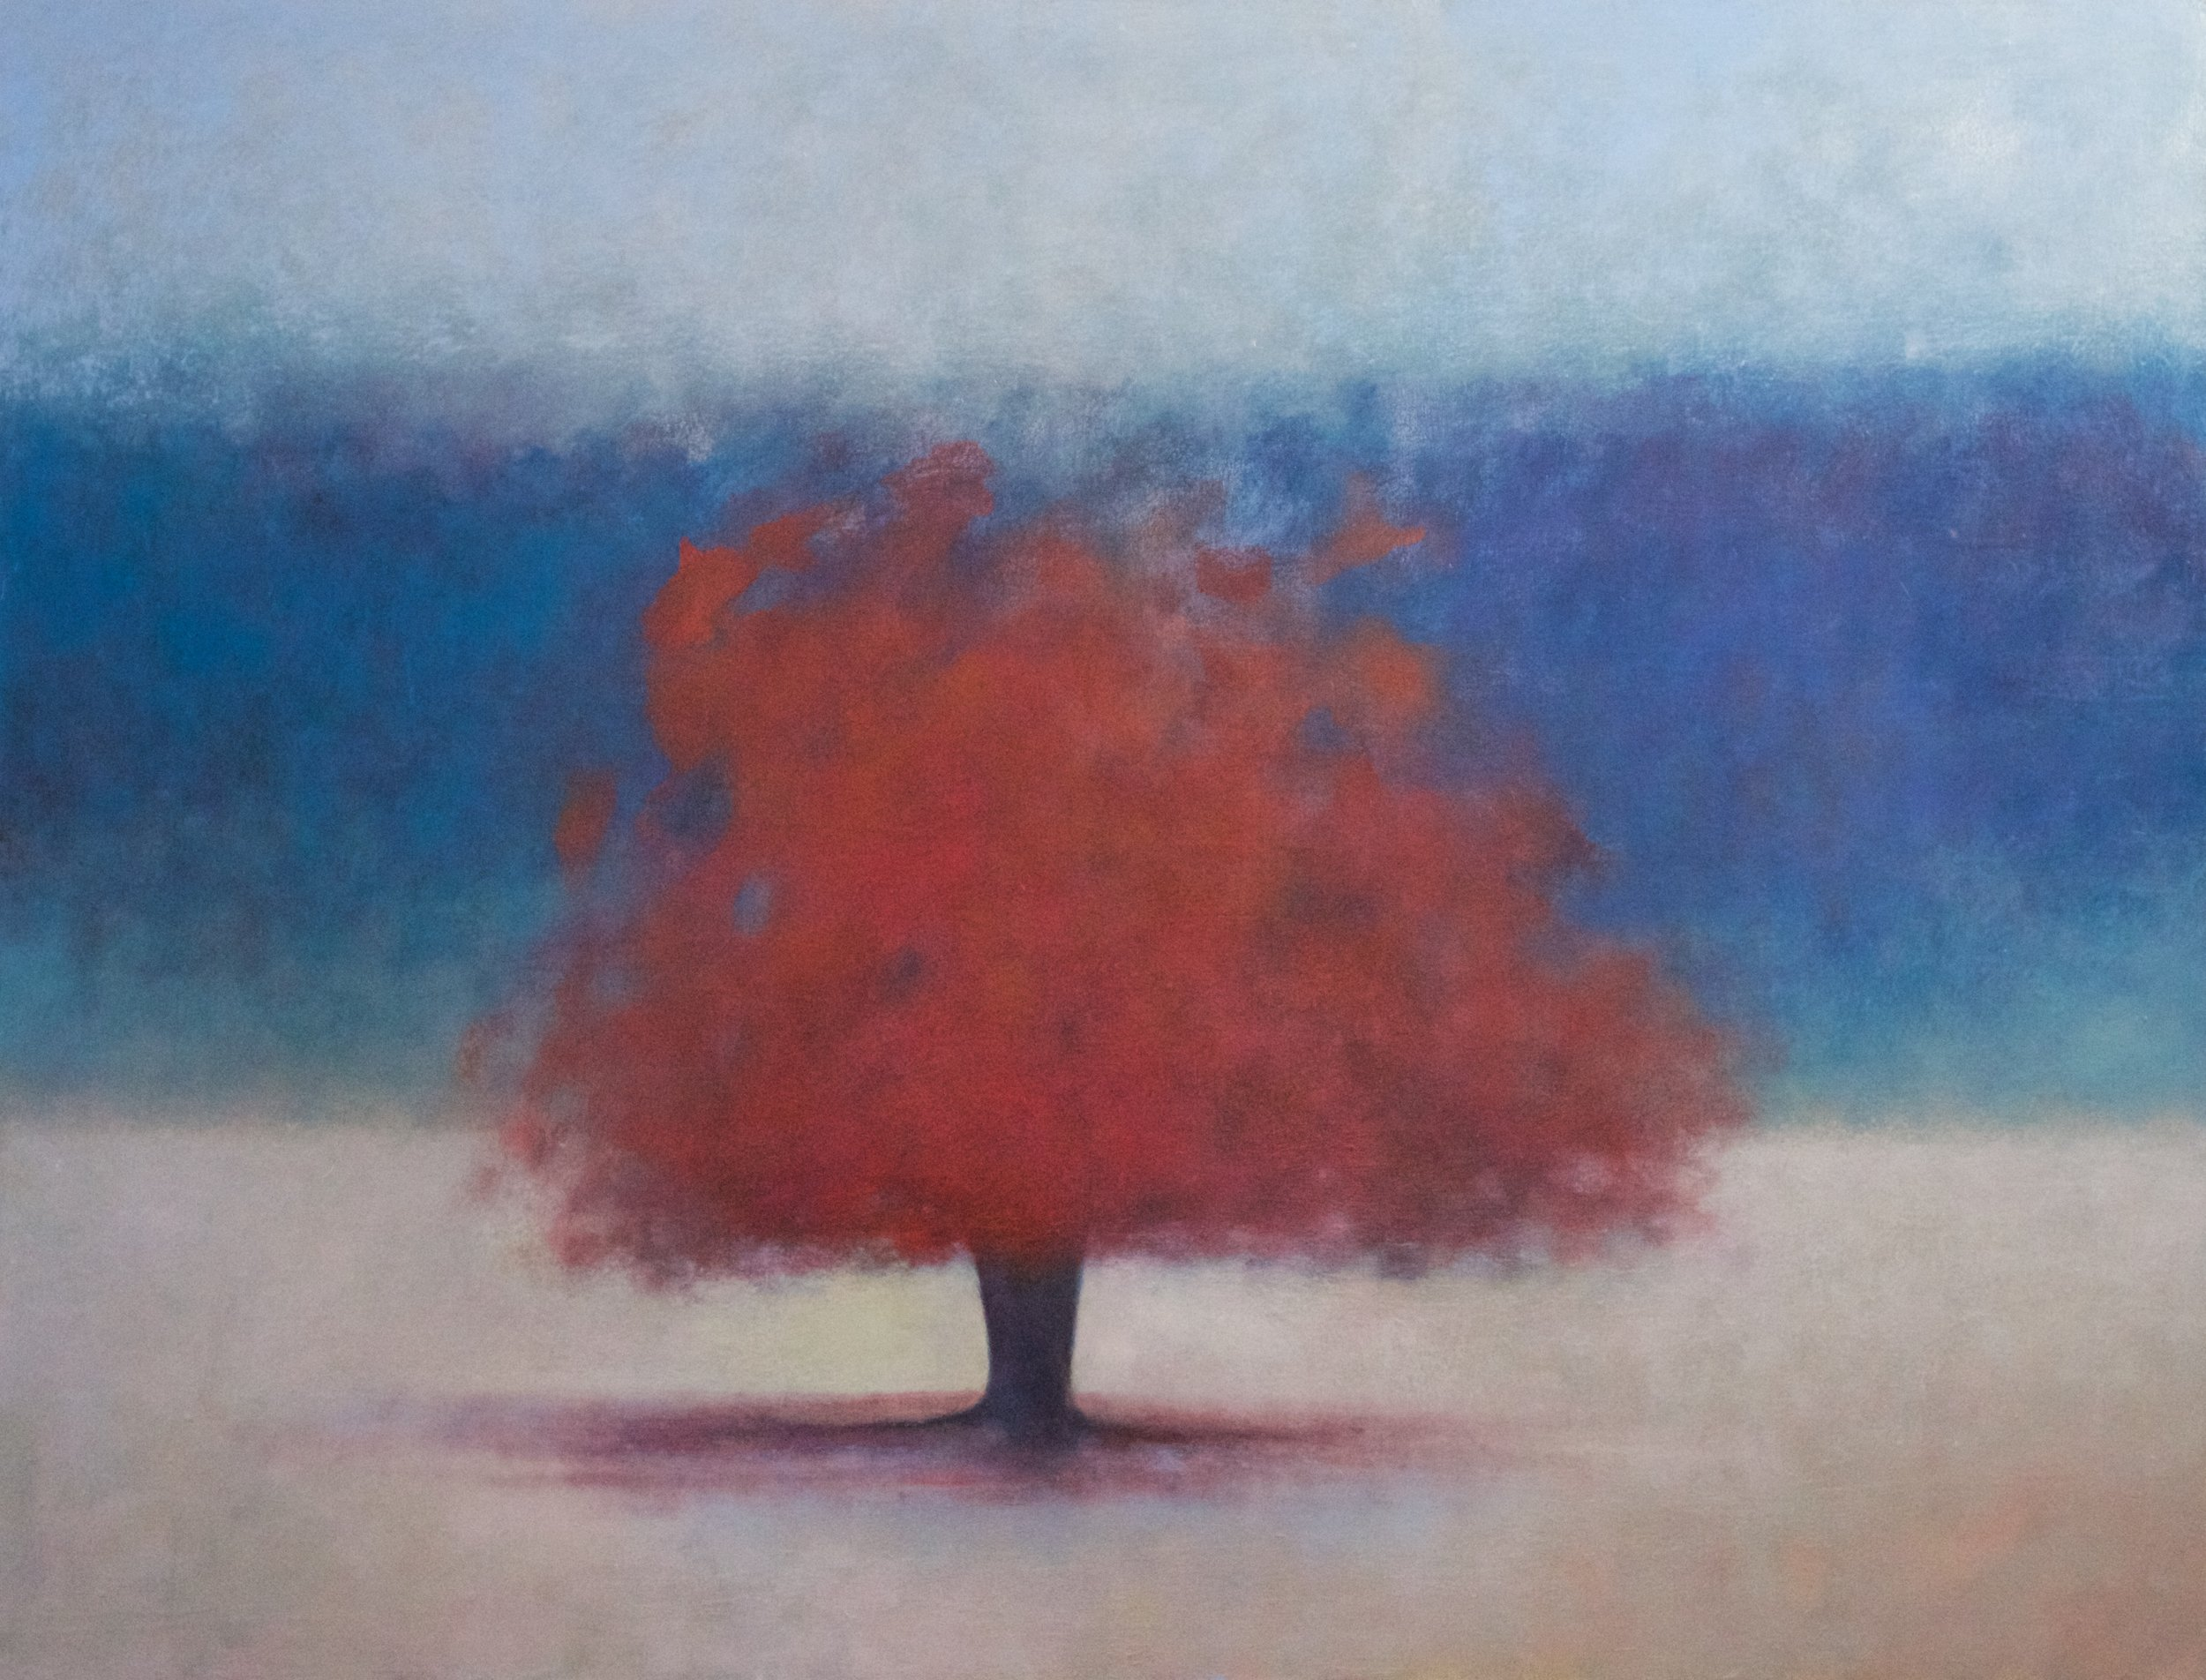 Title: Gloam  Size: 82 x 107 cm  Medium: Oil on canvas  Price:£2500